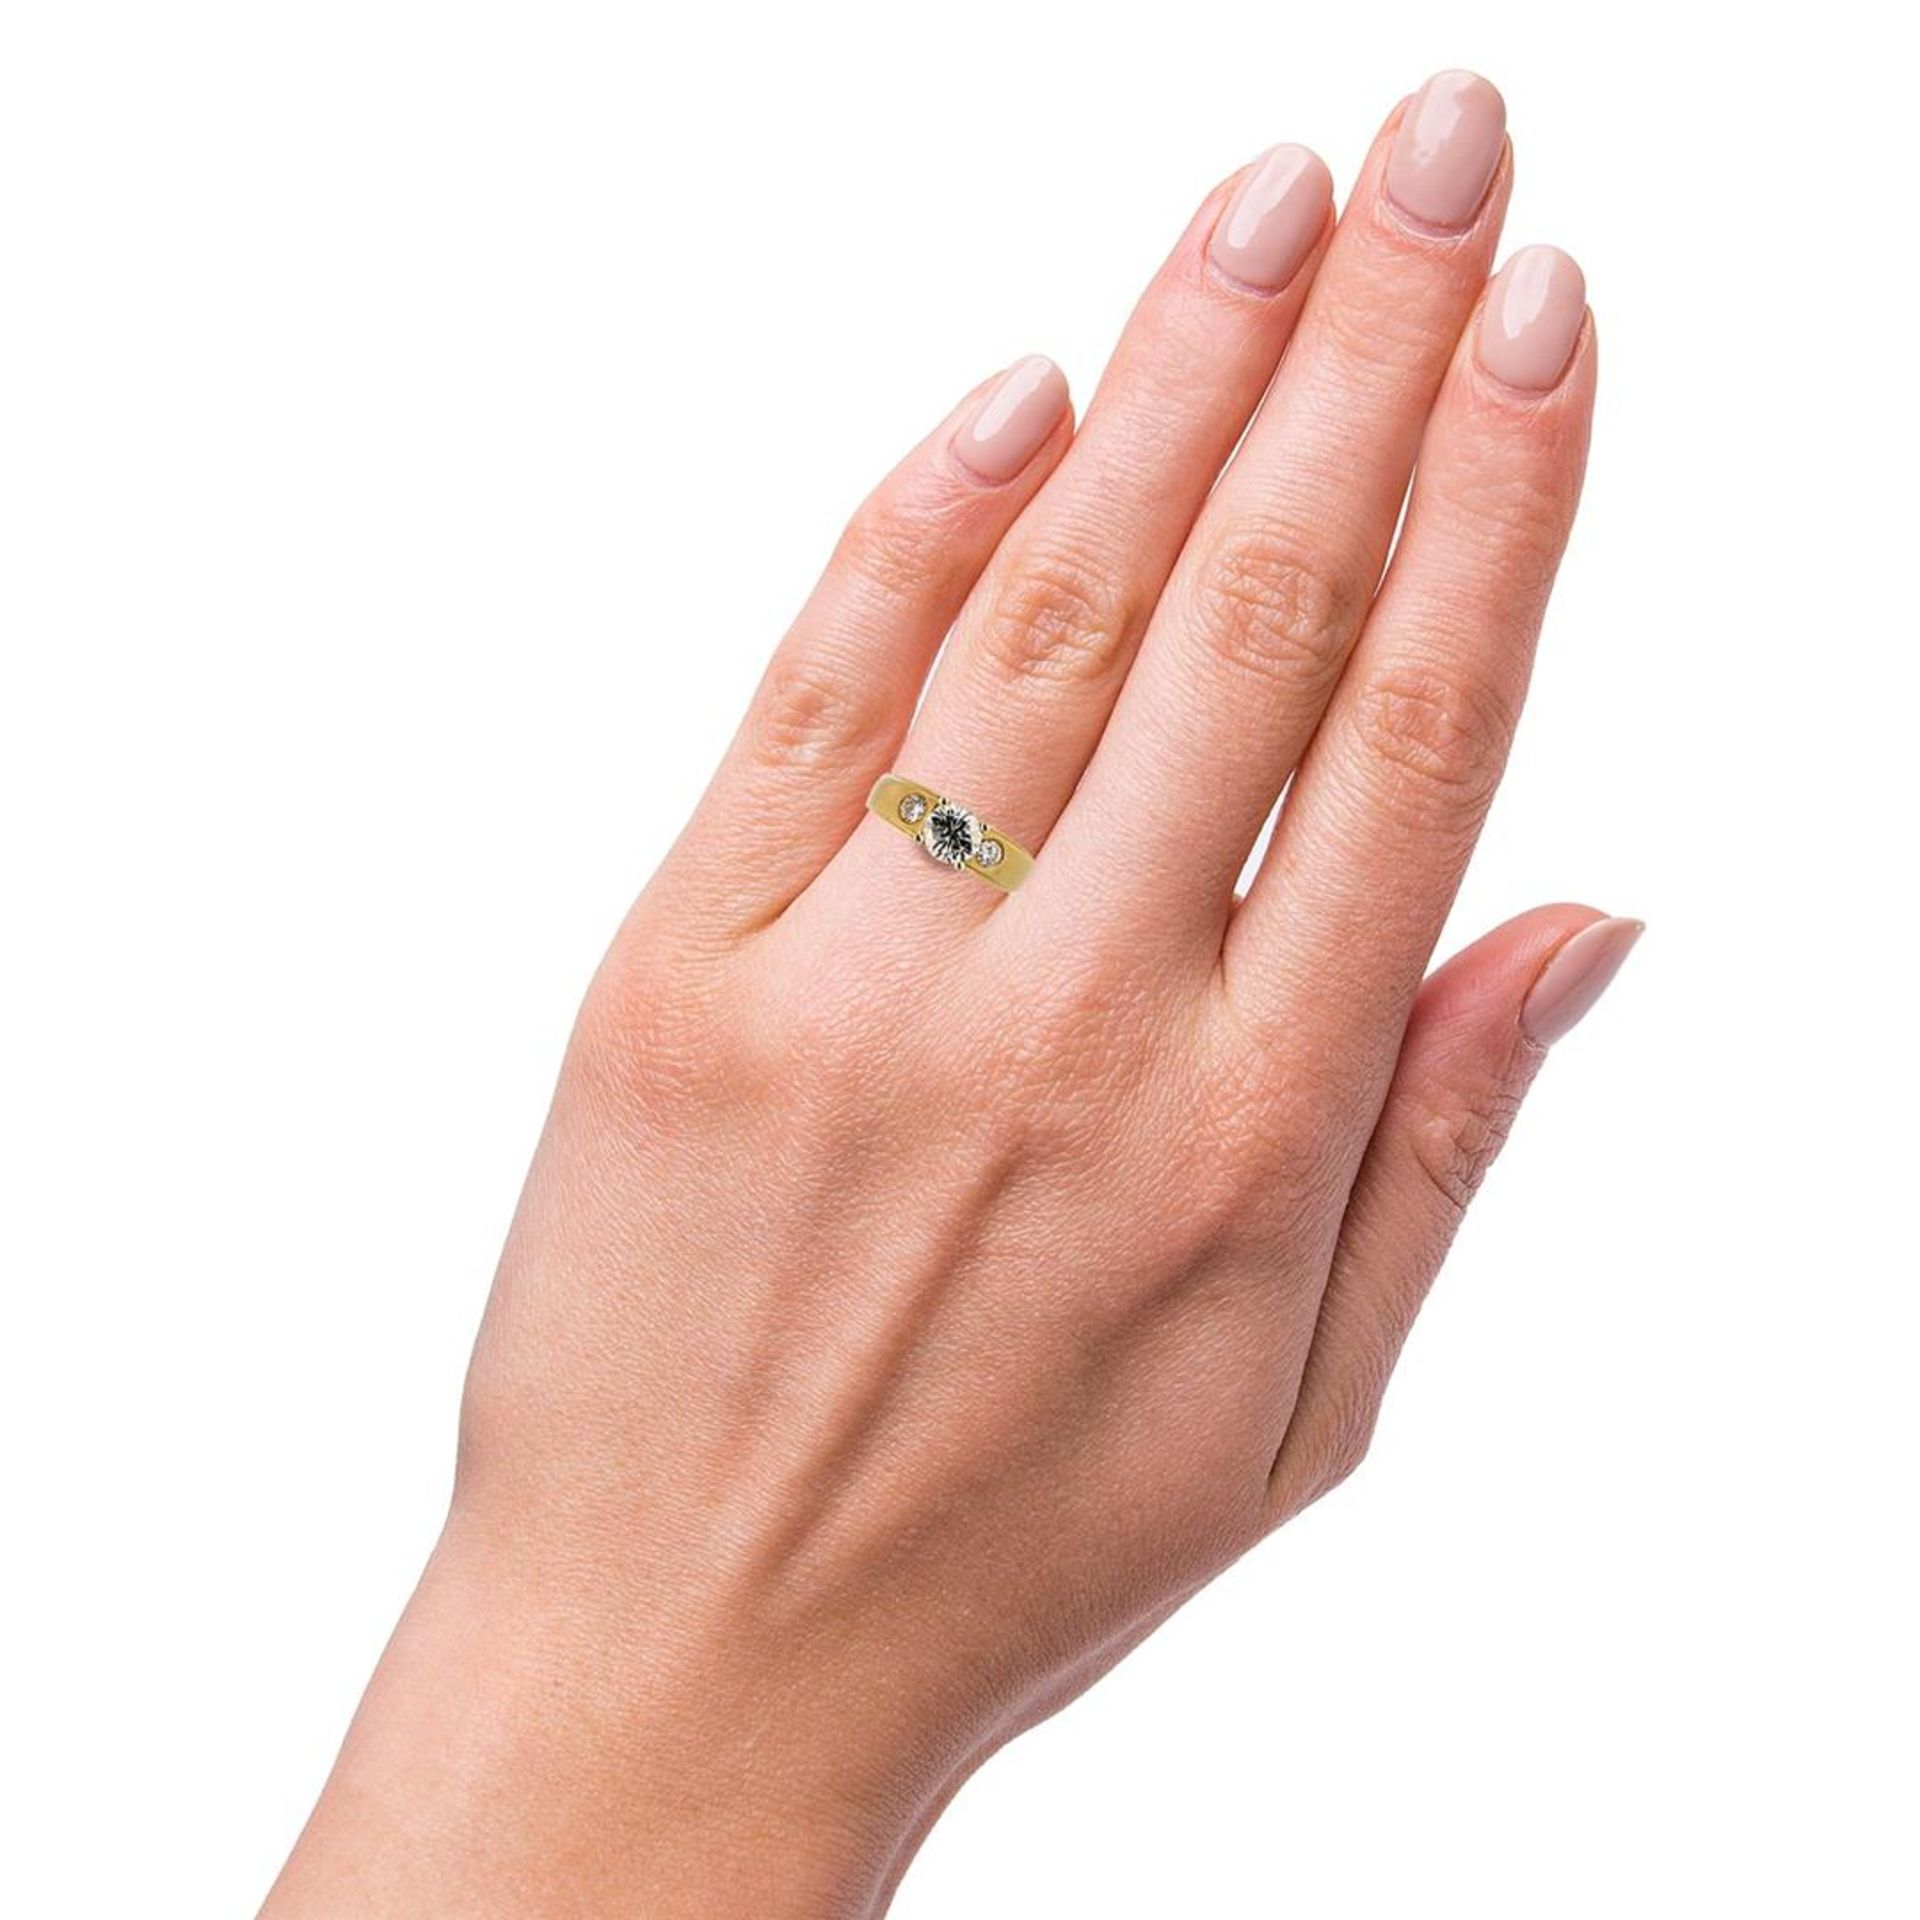 0.97ct SI2 Diamond 18K Yellow Gold Unity Ring (1.26ctw Diamonds) - Image 3 of 4